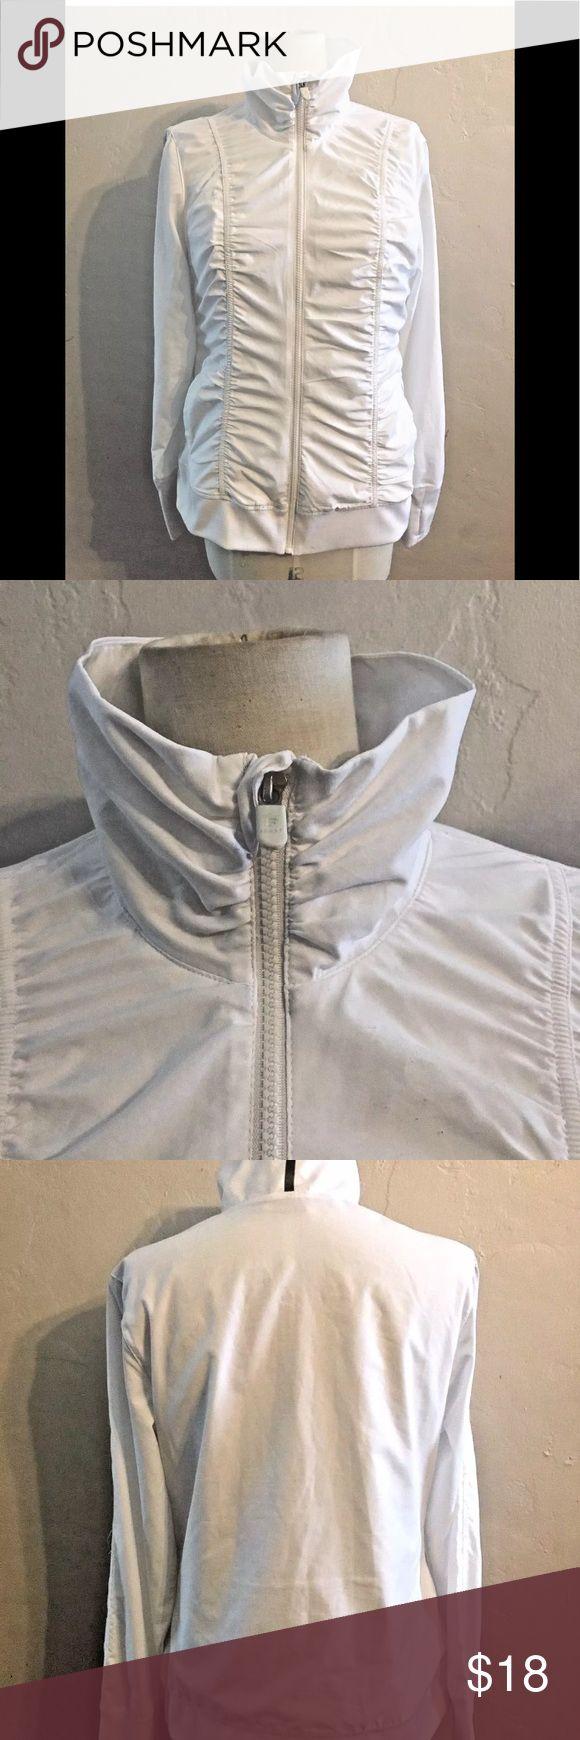 Fila Sport Womens white jacket Large Lightweight sports, athletic jacket. Zip up, roushing, lined with soft mesh. fila sport Jackets & Coats